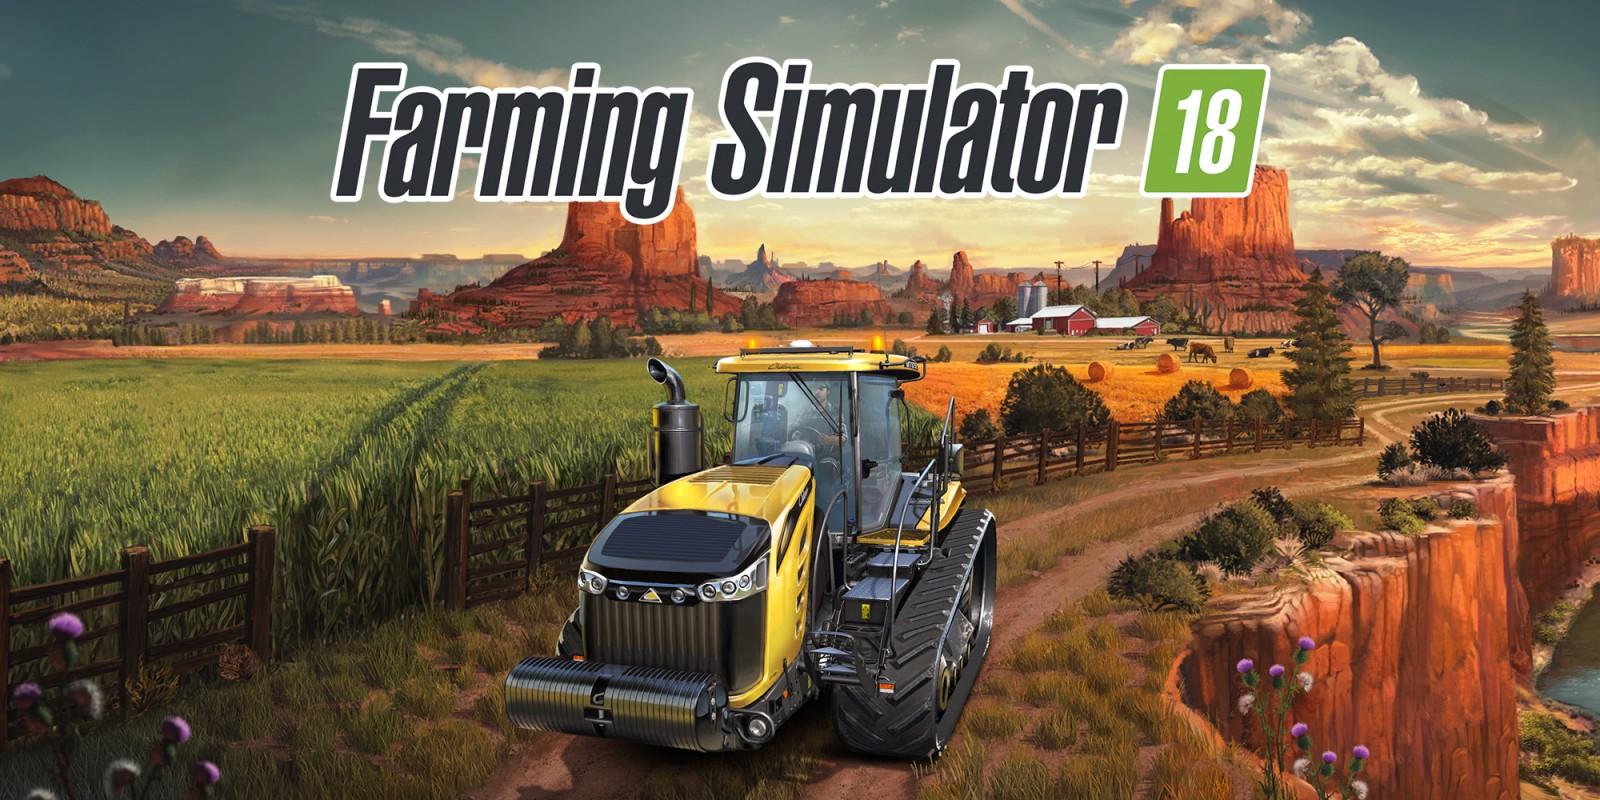 Farming Simulator 18 Full Version PC Game Free Download